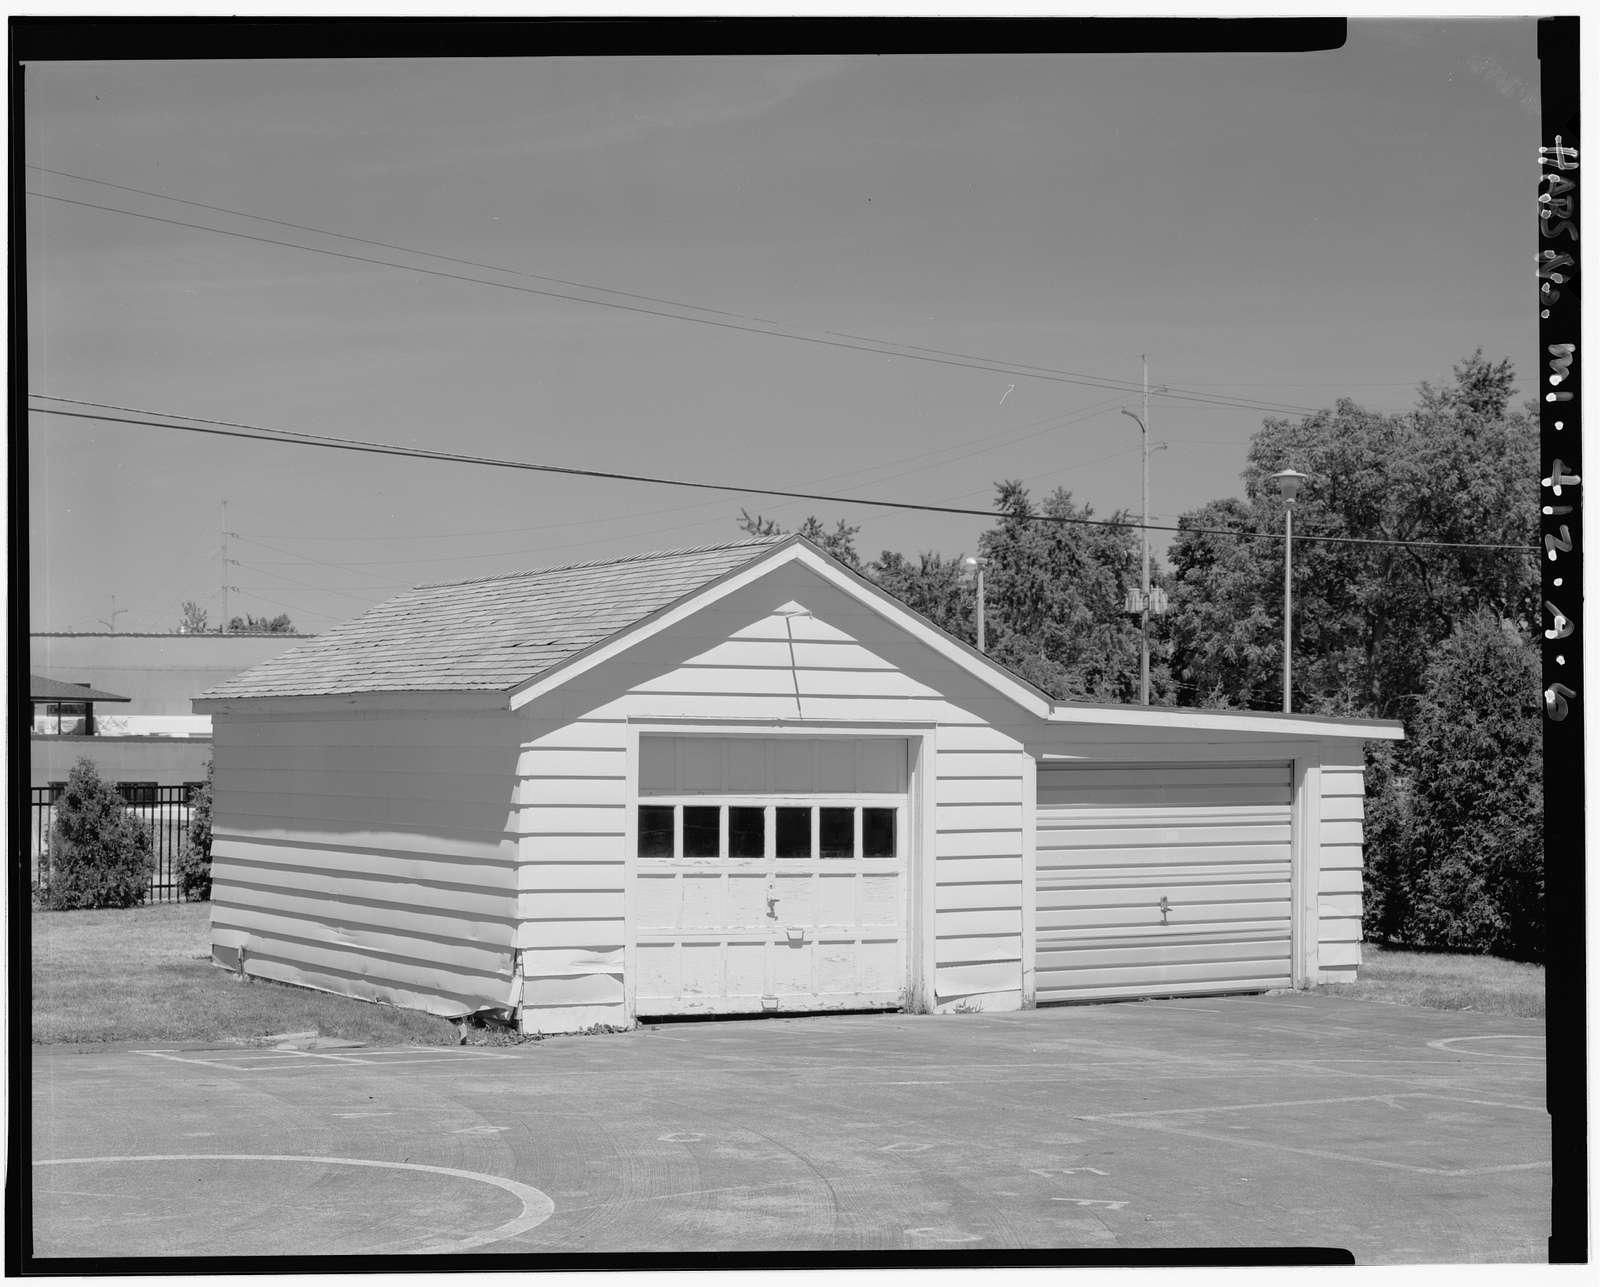 Percy Jones Hospital, Commander's Quarters, 100 West Washington Street, Battle Creek, Calhoun County, MI